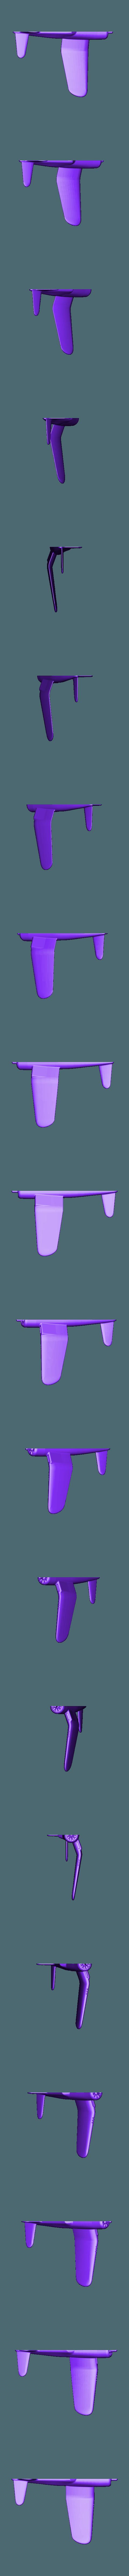 demi_F4U_droit_HD.STL Download STL file F4U Corsair • 3D printing model, 3Dmodeling